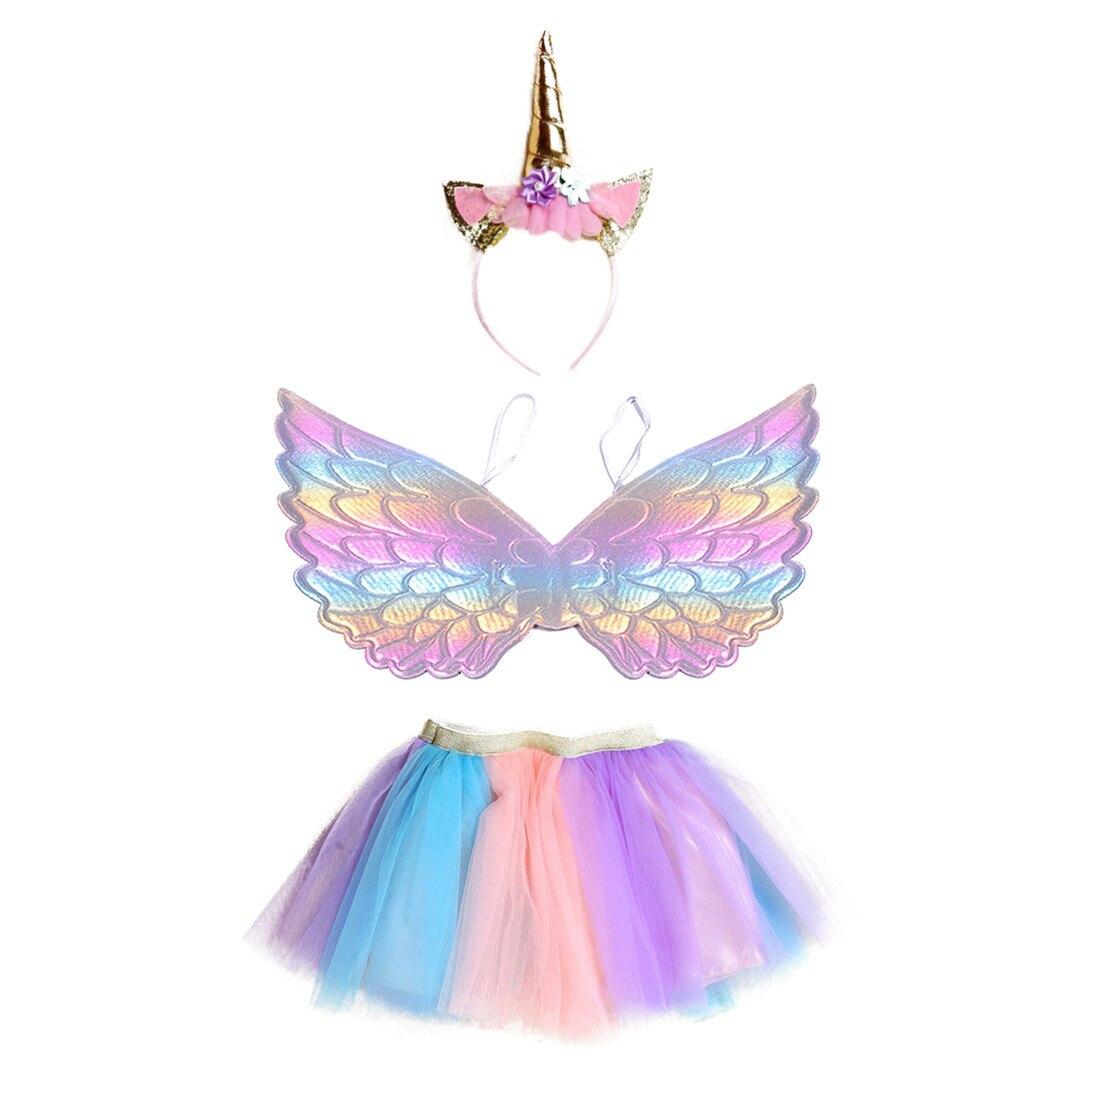 Rainbow Girls Party Mesh Tutu Skirt Unicorn Hair Bands Colorful Gradient Wings Children's Mini Fairy Skirts Three Piece Suits